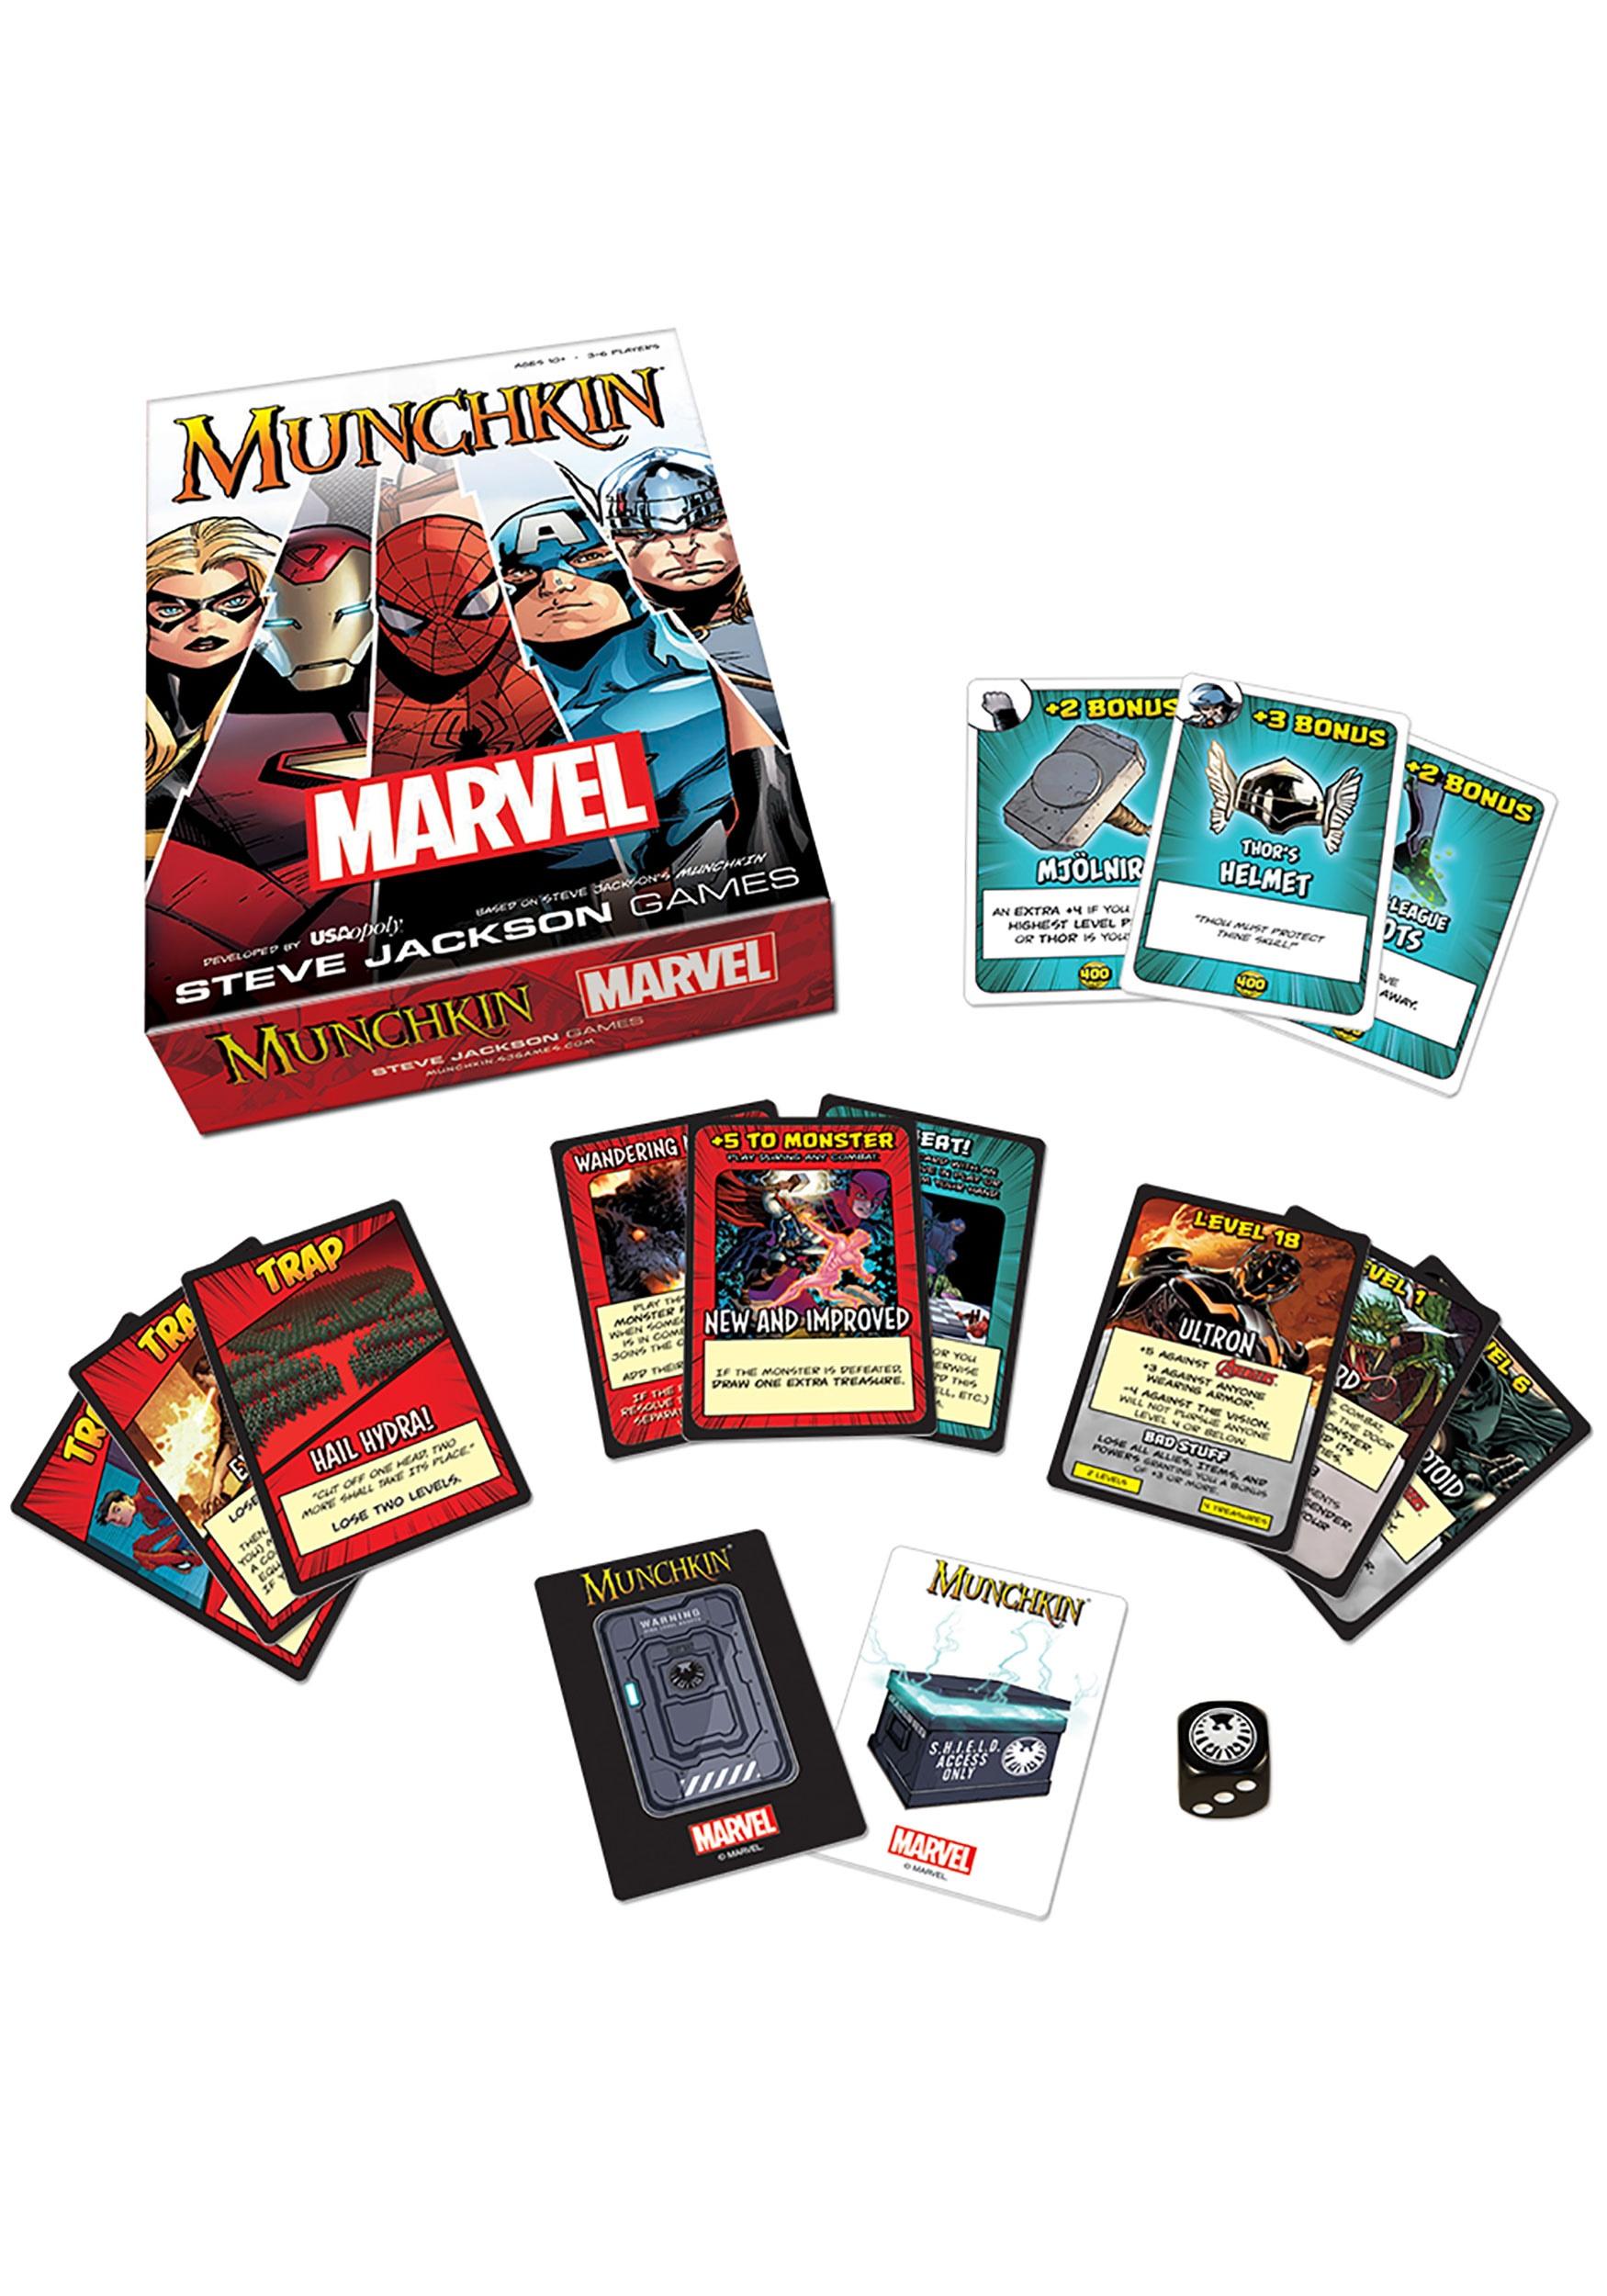 MUNCHKIN Game - Marvel Edition